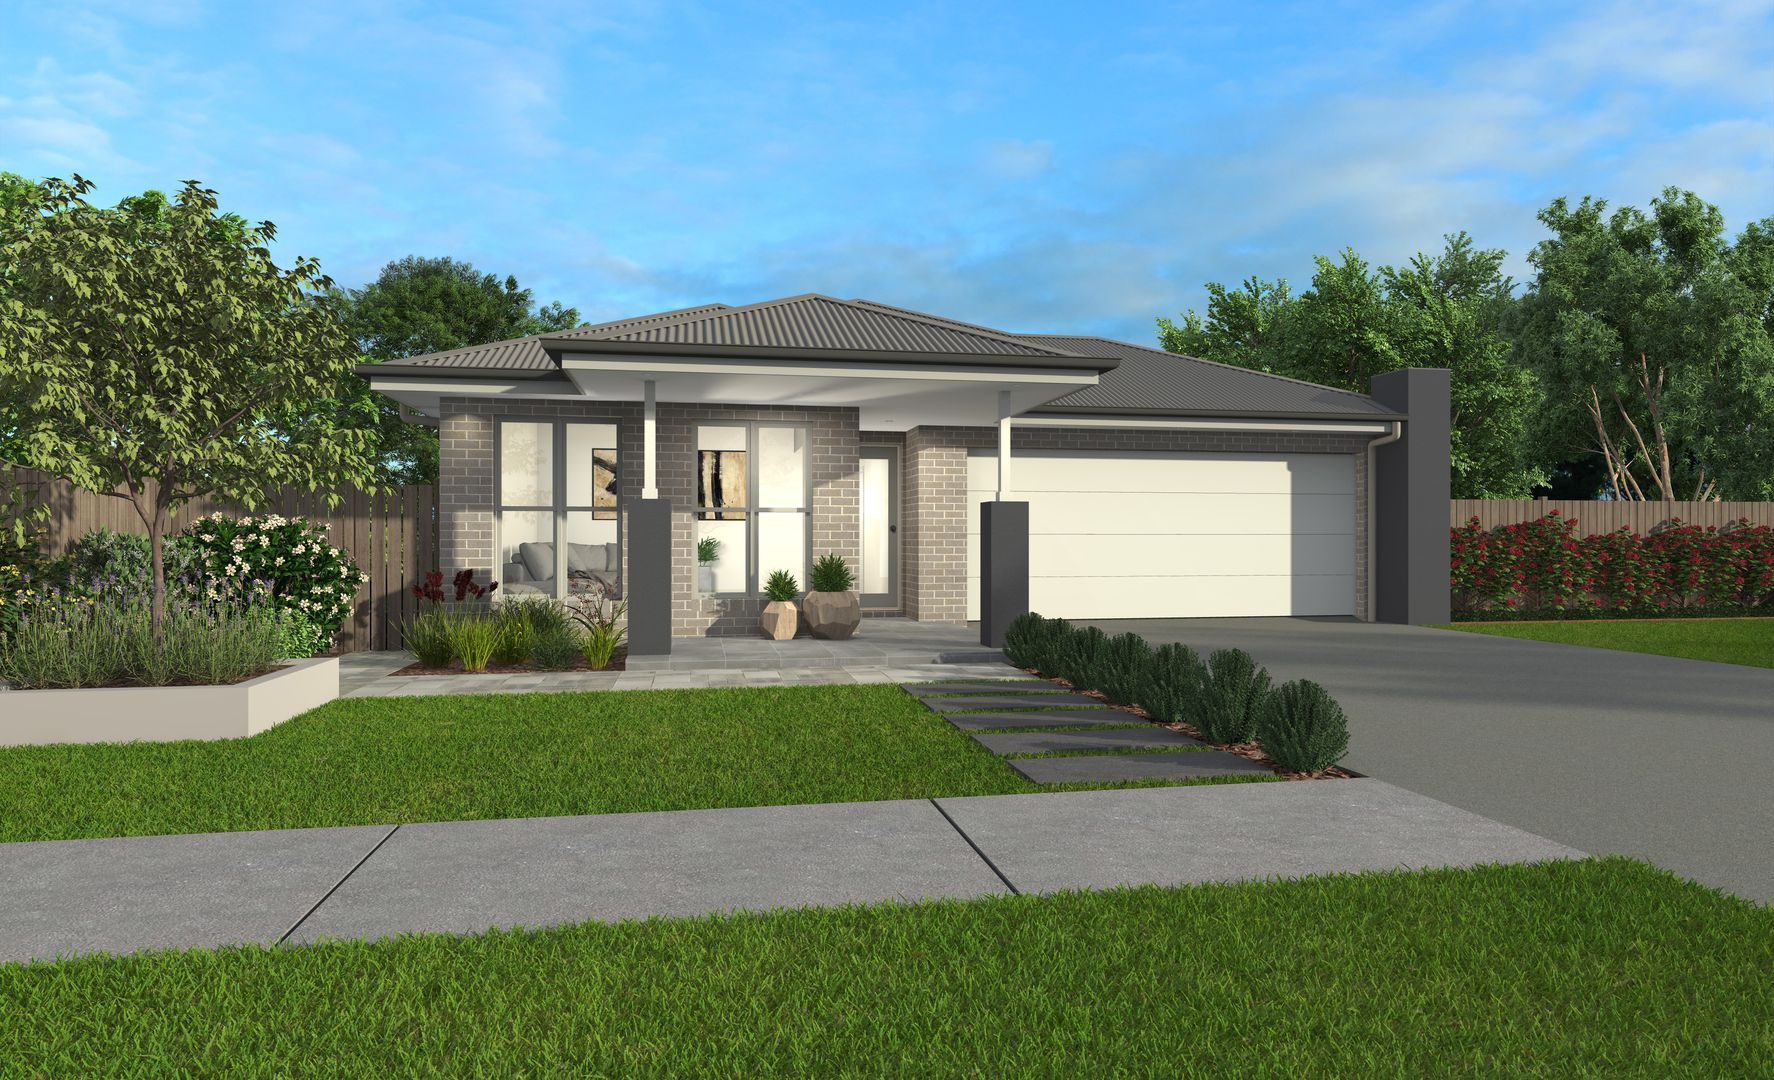 Lot 128 Cleaver Street, Googong NSW 2620, Image 0